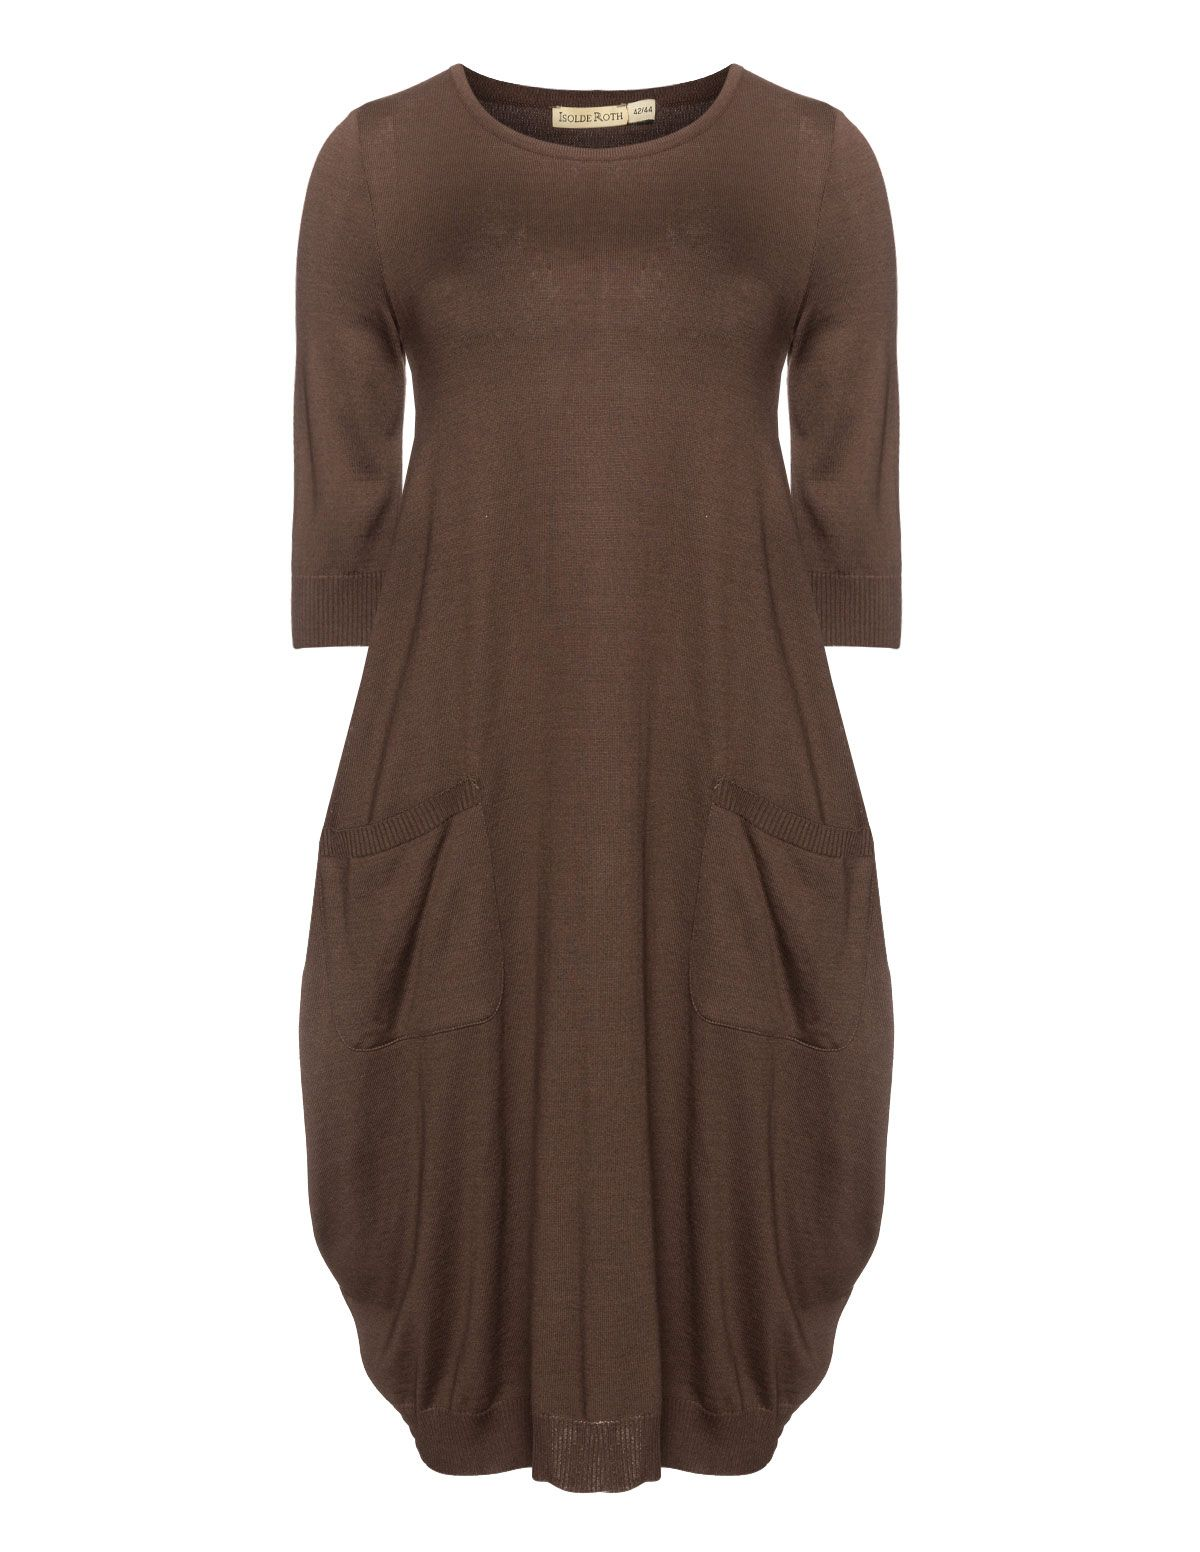 0d0a4493c84f79 Isolde Roth Fine knit balloon dress in Brown Jurken In Grote Maten, Grote  Mode Maten